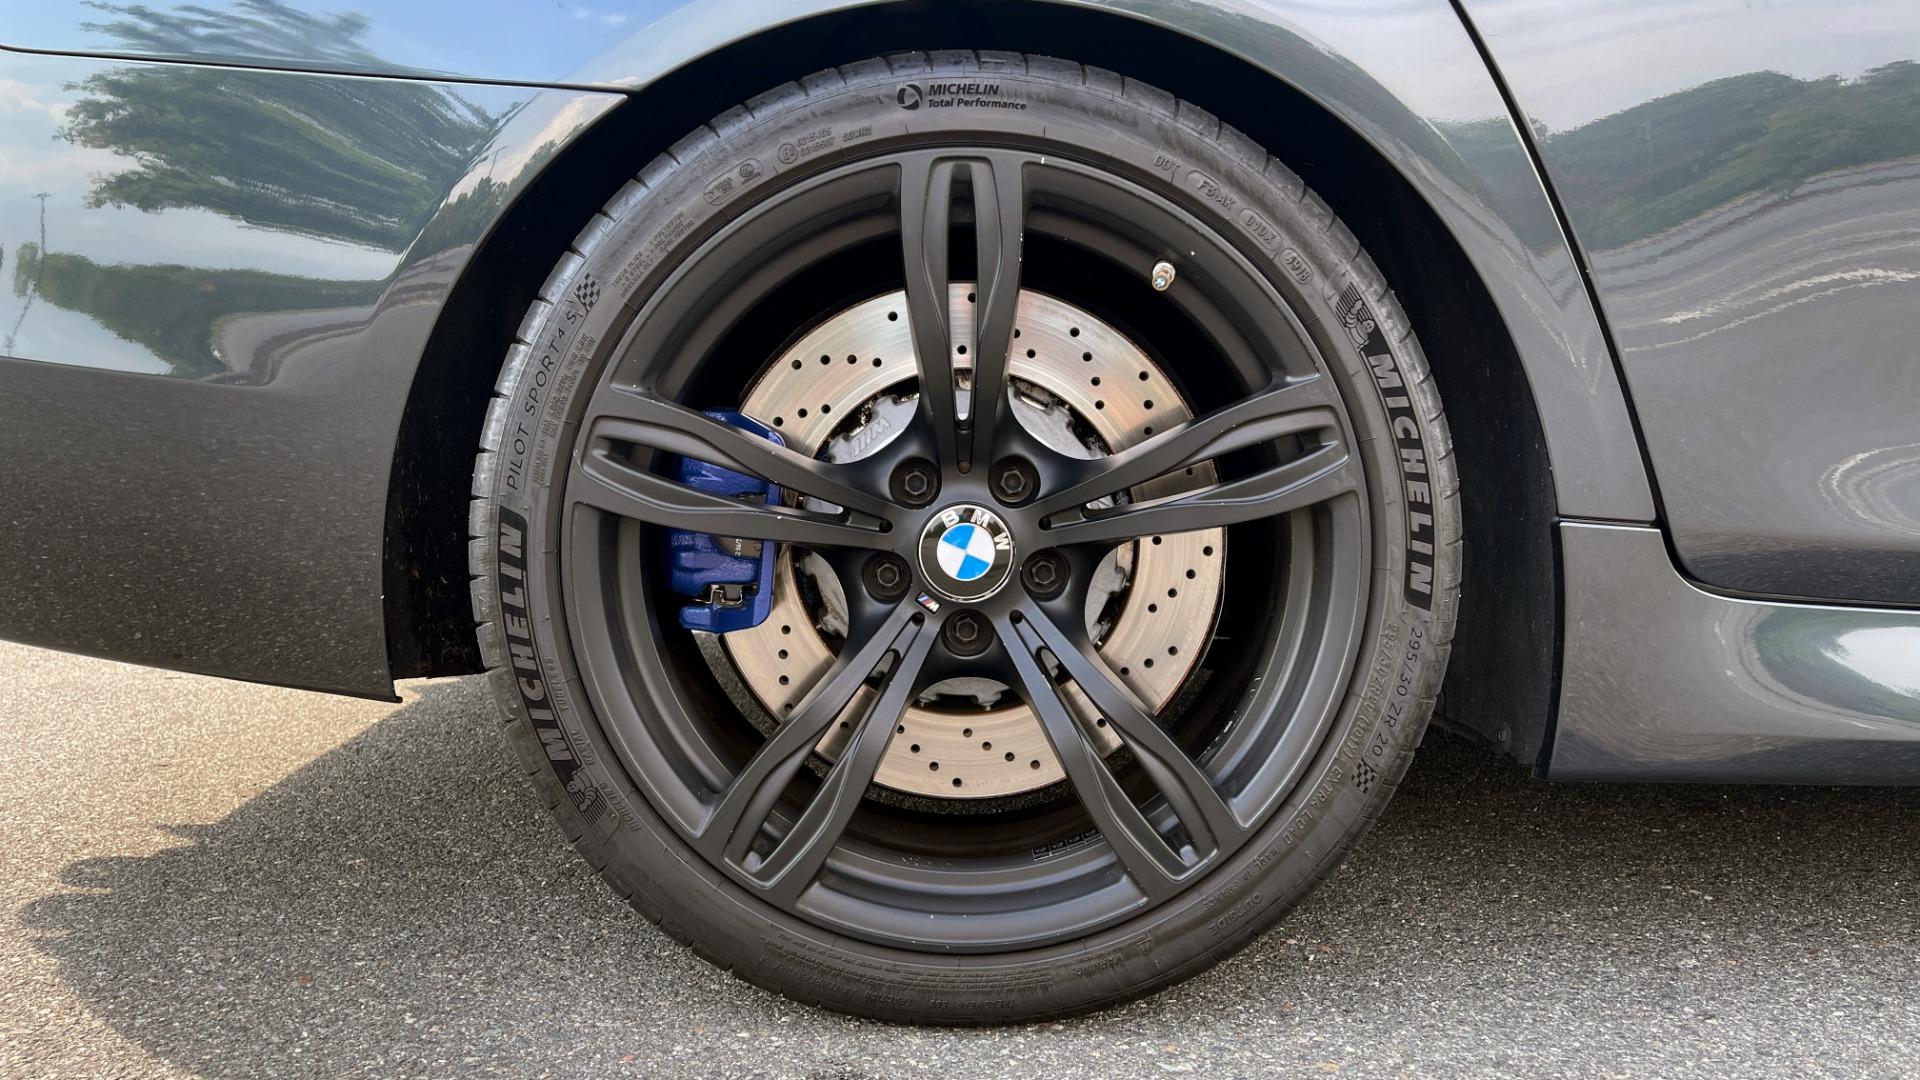 Used 2015 BMW M5 SEDAN / EXEC PKG / HUD / NAV / B&O SND / SUNROOF / REARVIEW for sale Sold at Formula Imports in Charlotte NC 28227 100